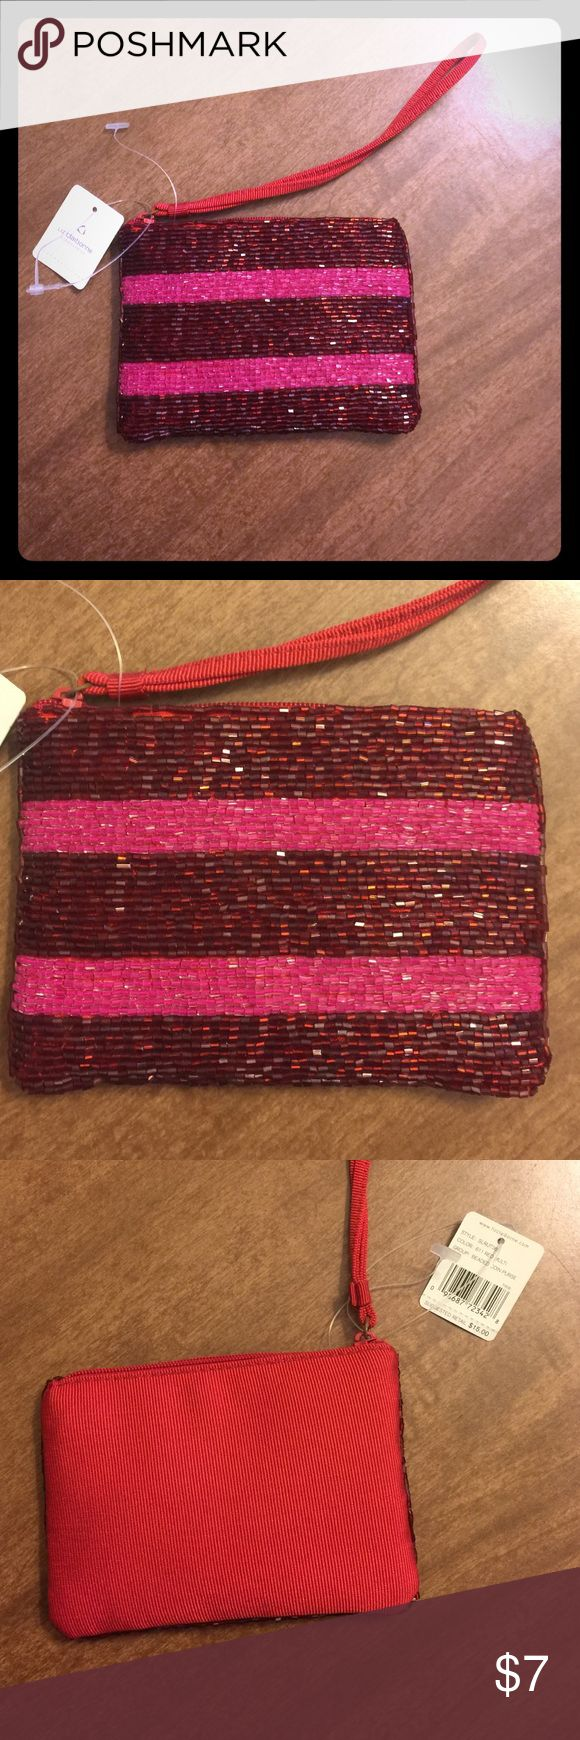 Liz Claiborne wristlet Brand new with tags Liz Claiborne Bags Clutches & Wristlets